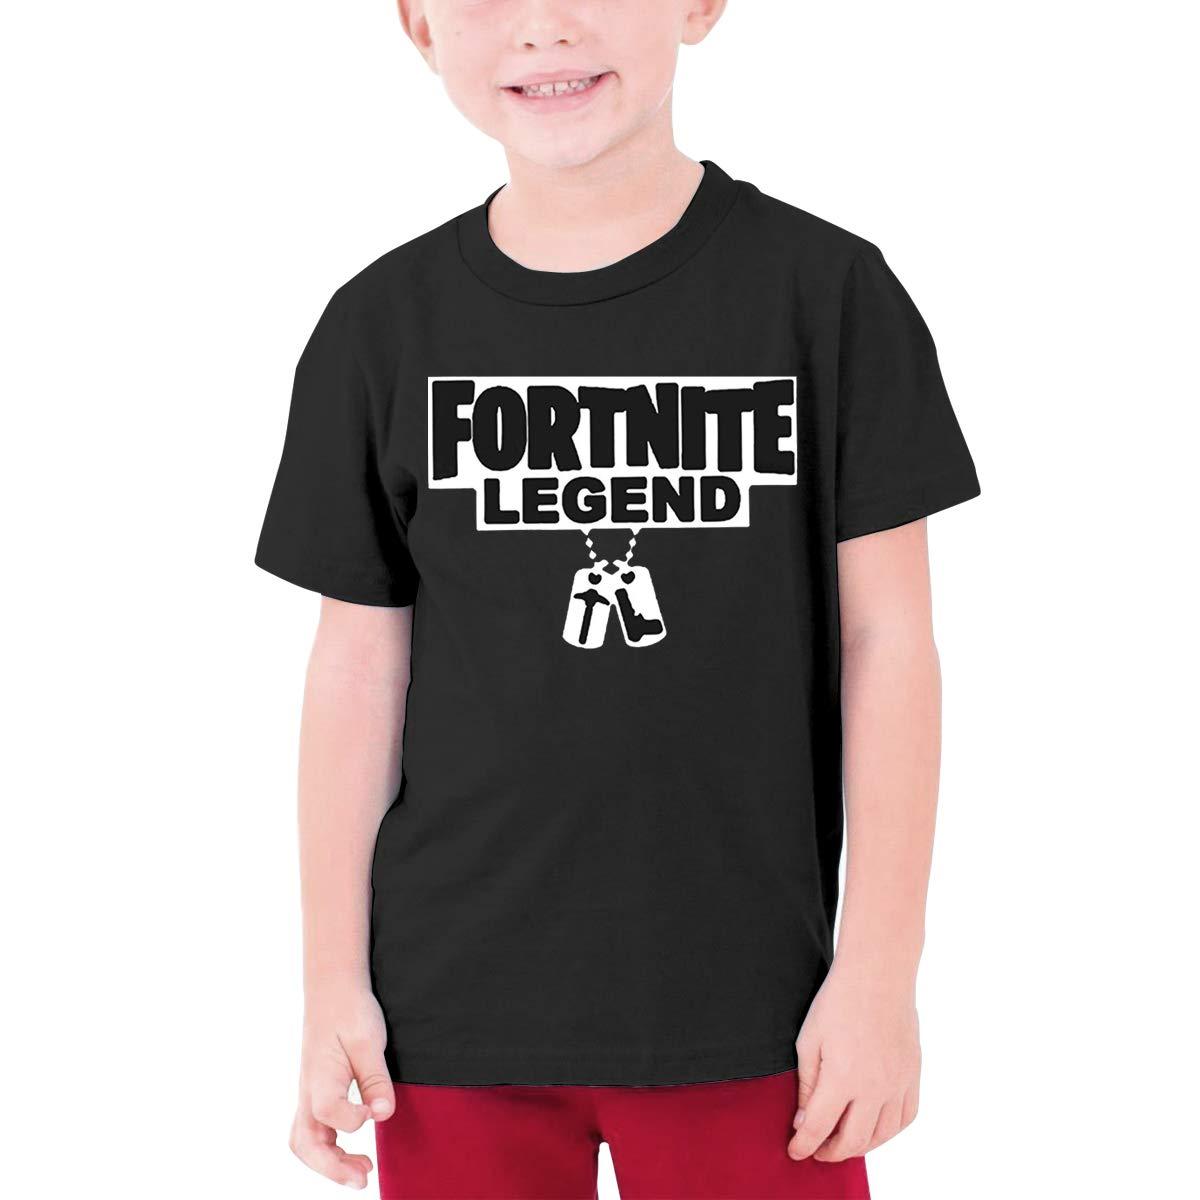 9fa9bdcd3 Amazon.com: fresh tees Fortnite Legend Gaming Youth T- Shirt (X- Large  14-16 Yrs, Black): Clothing